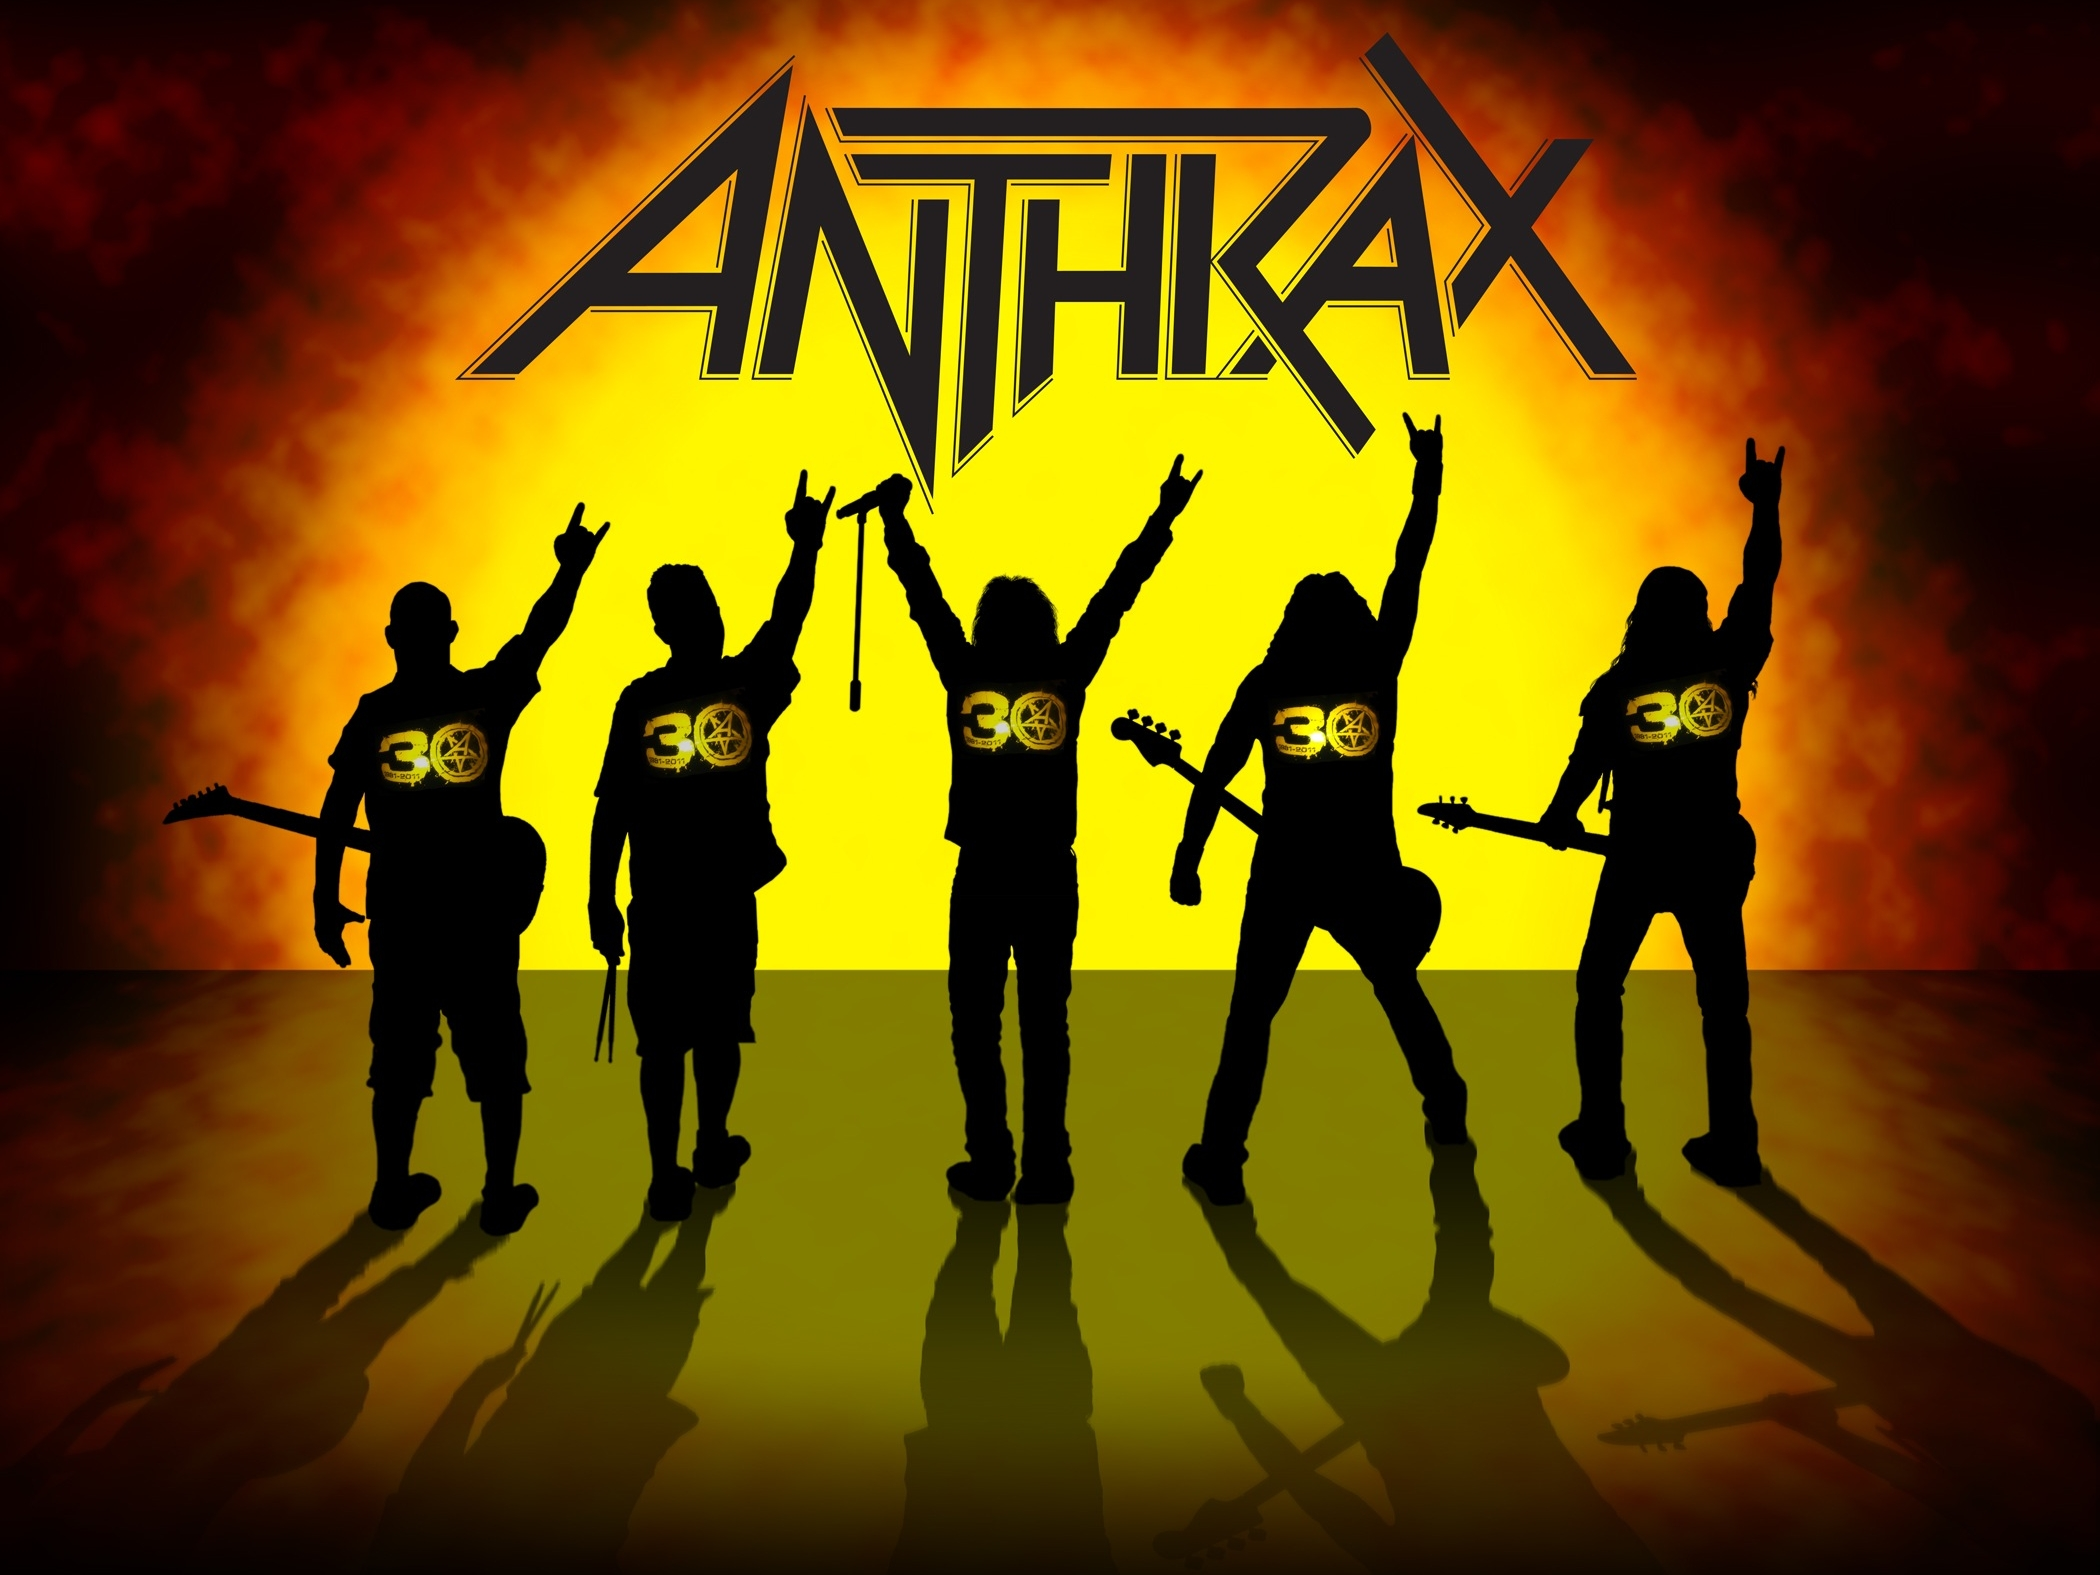 Anthrax heavy metal hard rock bands d wallpaper 2100x1575 2100x1575